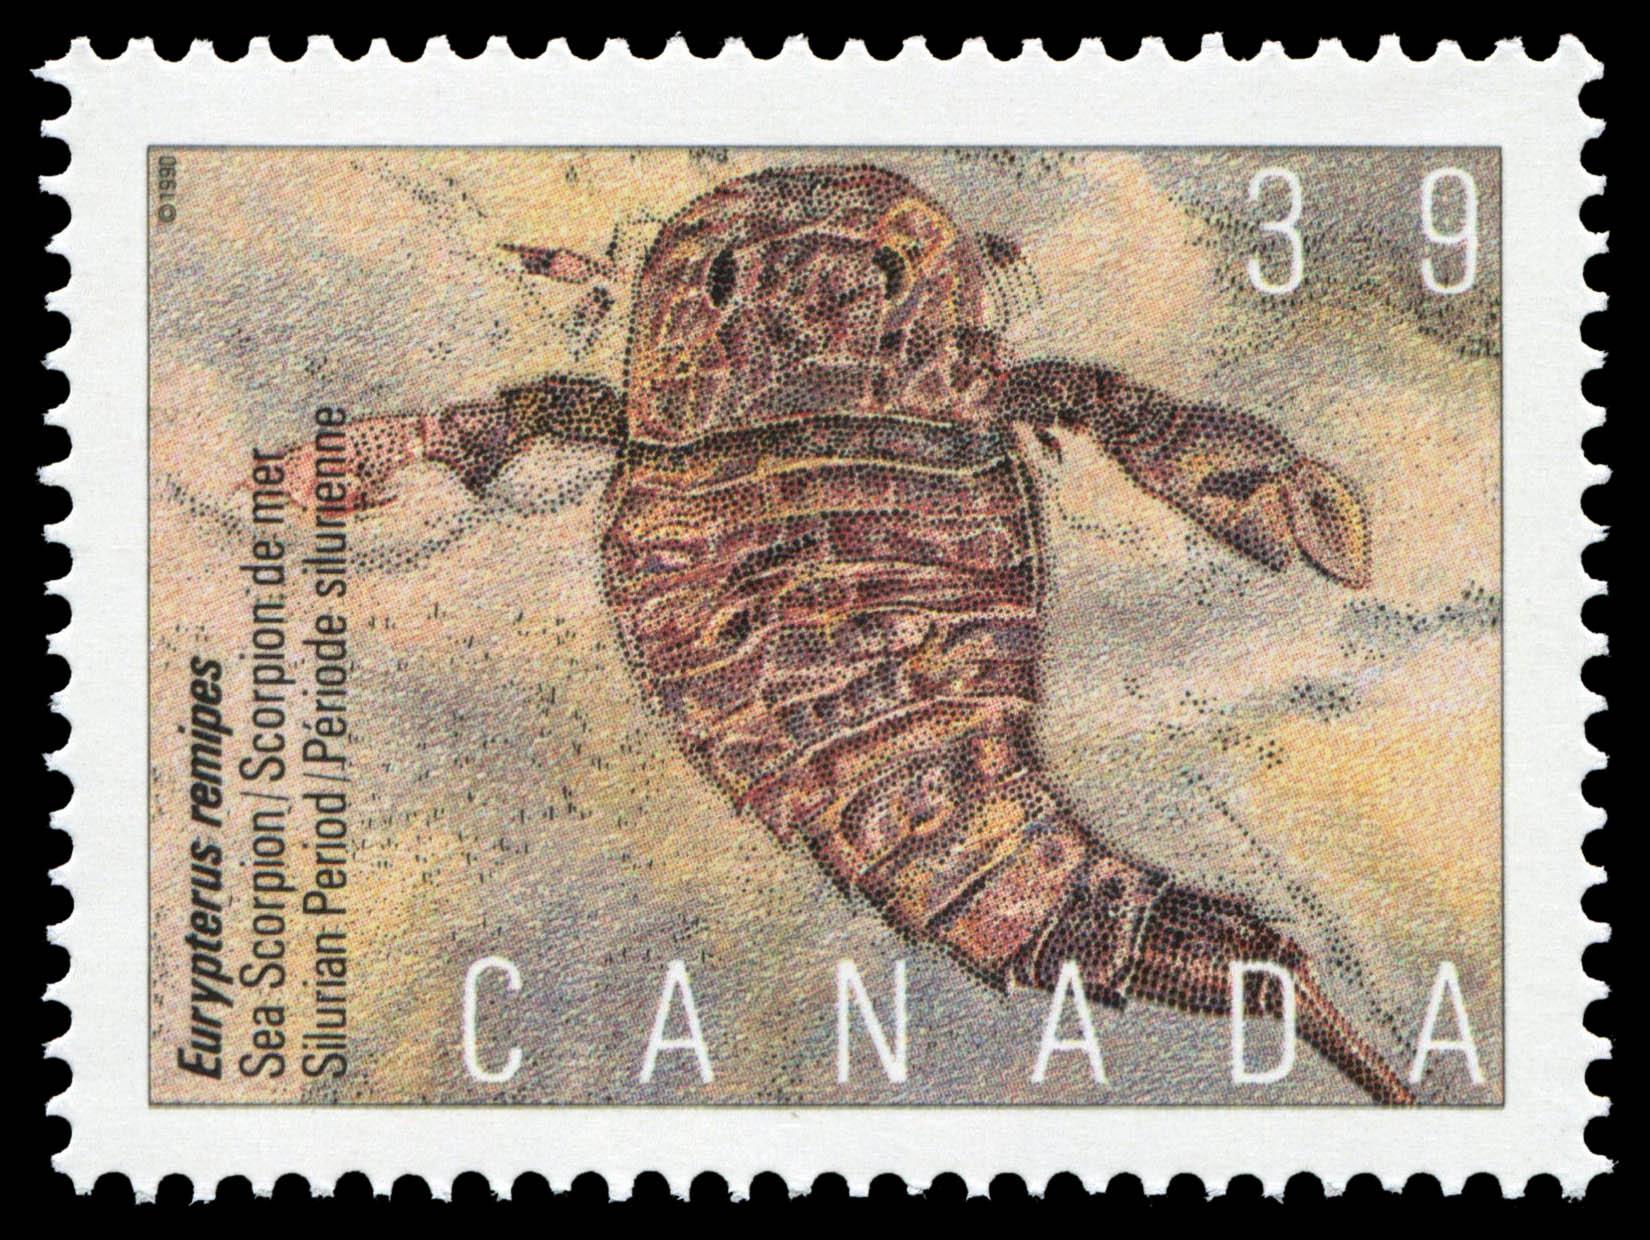 Eurypterus remipes, Sea Scorpion, Silurian Period Canada Postage Stamp | Prehistoric Life in Canada, The Age of Primitive Life